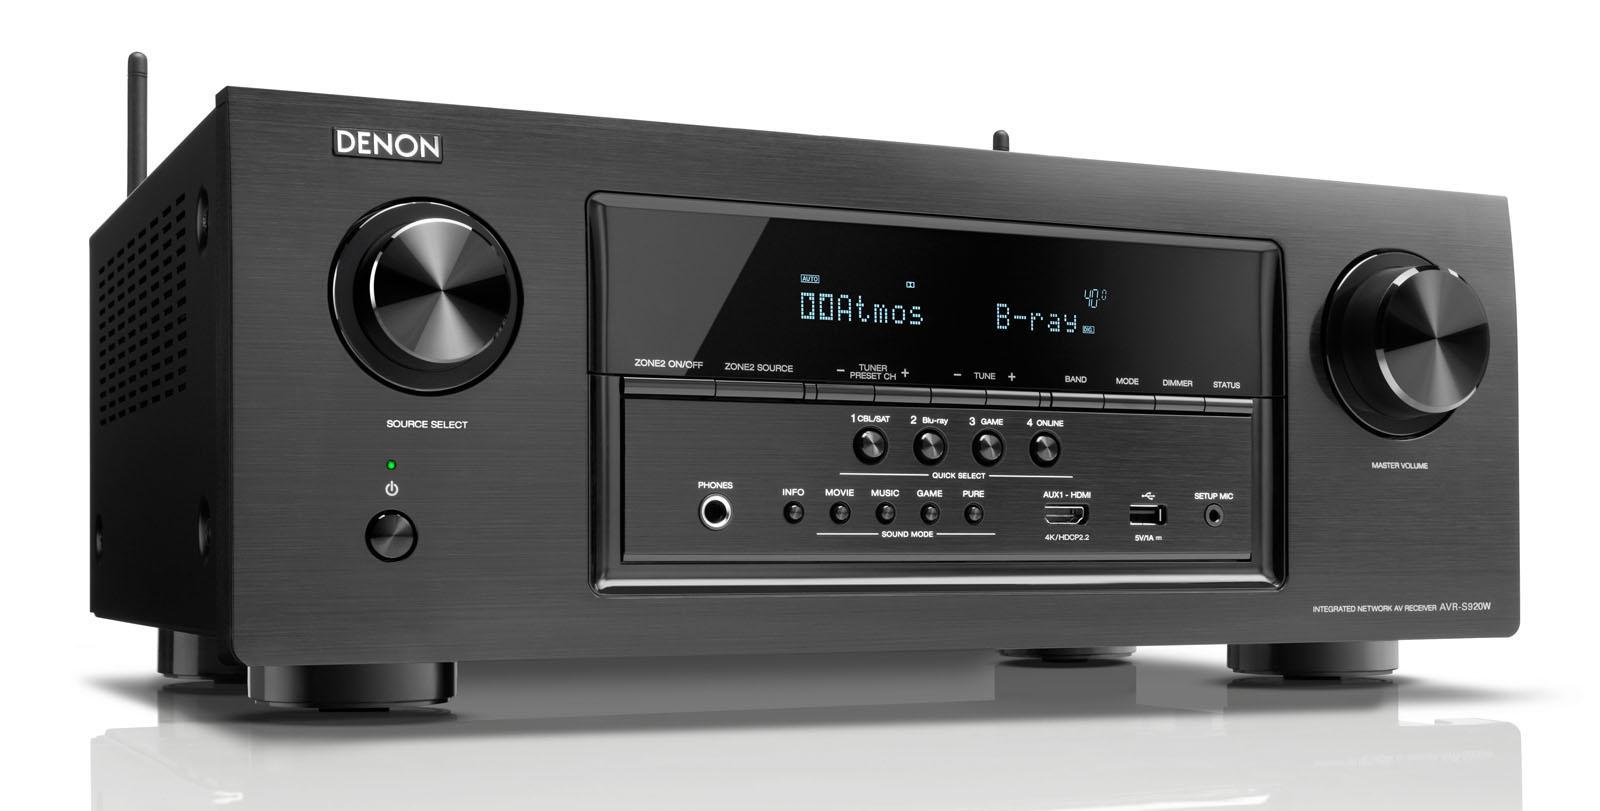 Denon Avr S920w Review Gearopen